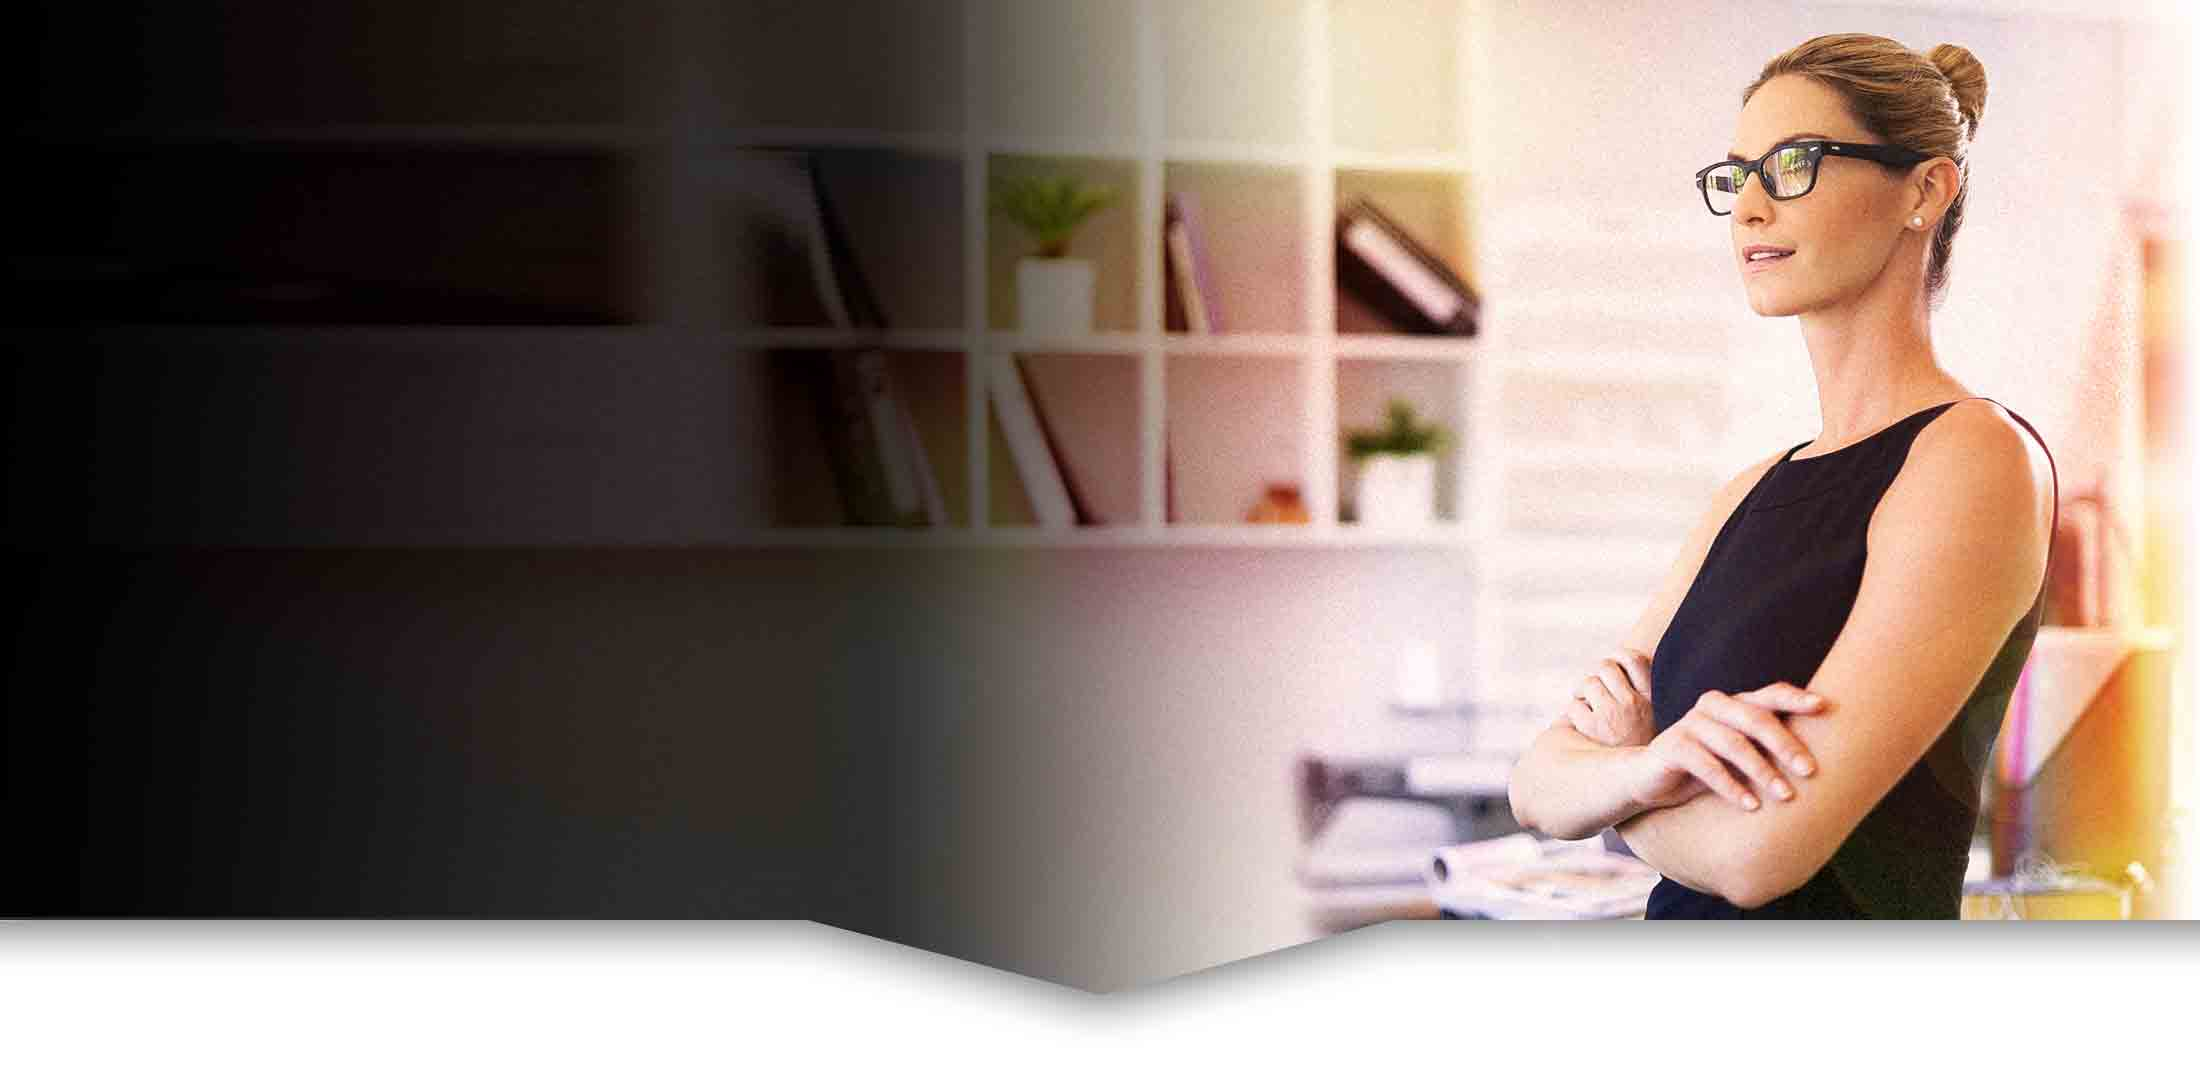 Image of a freelancer at work